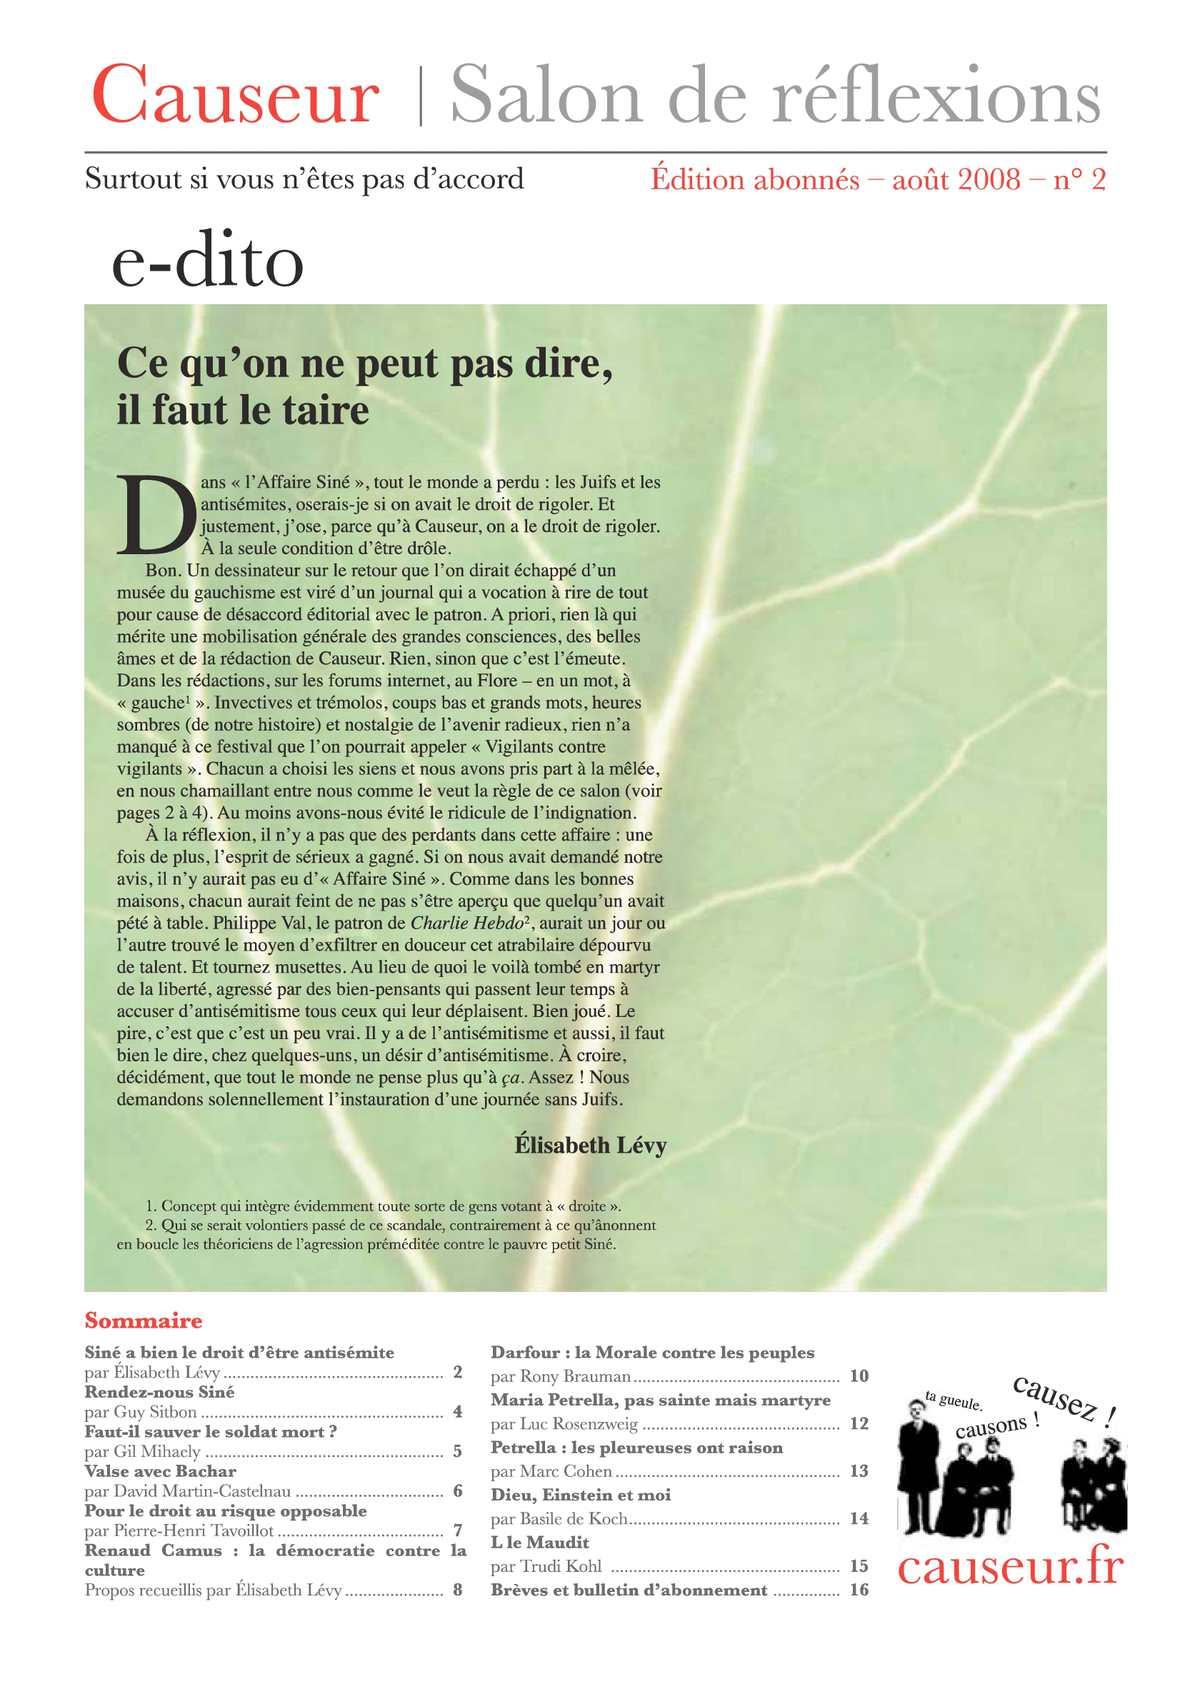 Euroligue (14e j.) - Causeur et Heurtel en forme - msn.com